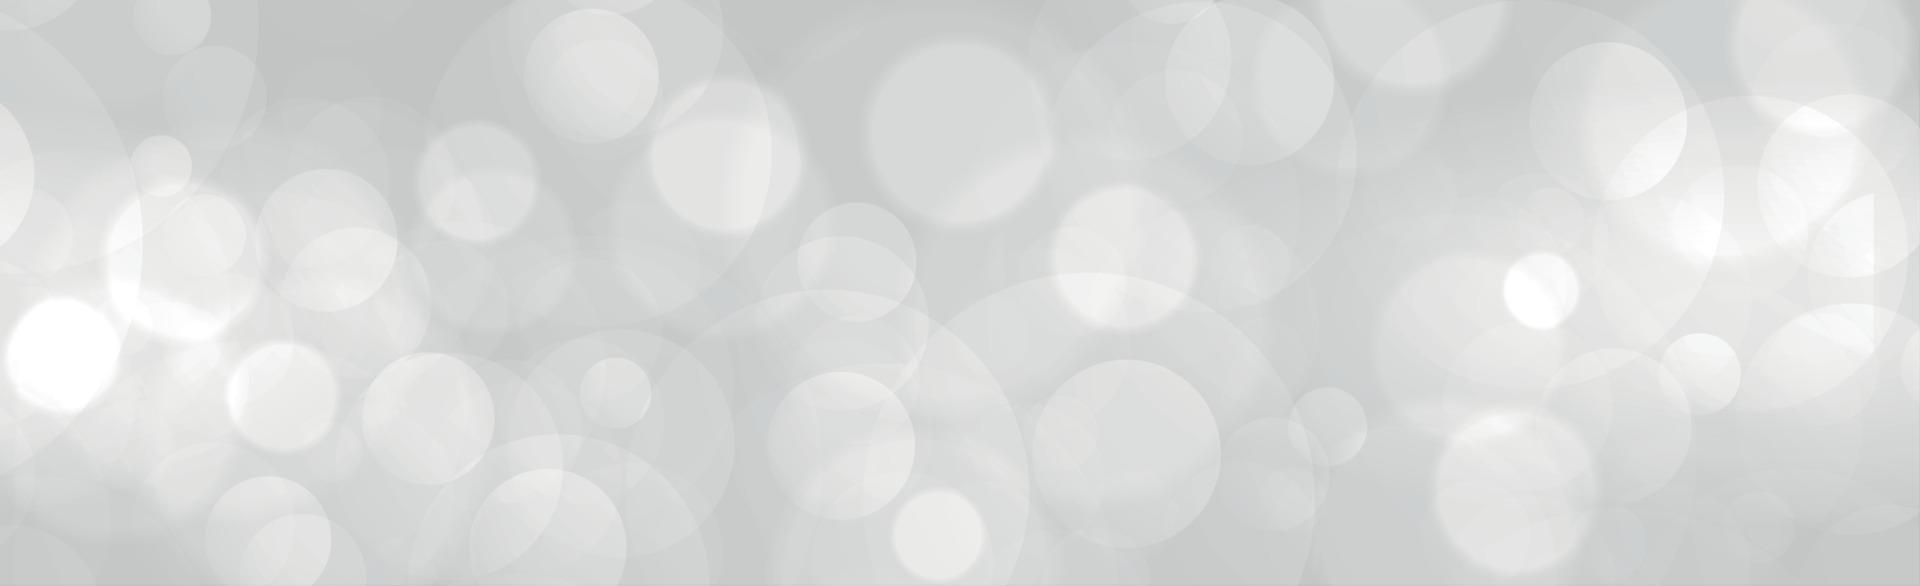 Bokeh borroso multicolor sobre un fondo claro vector